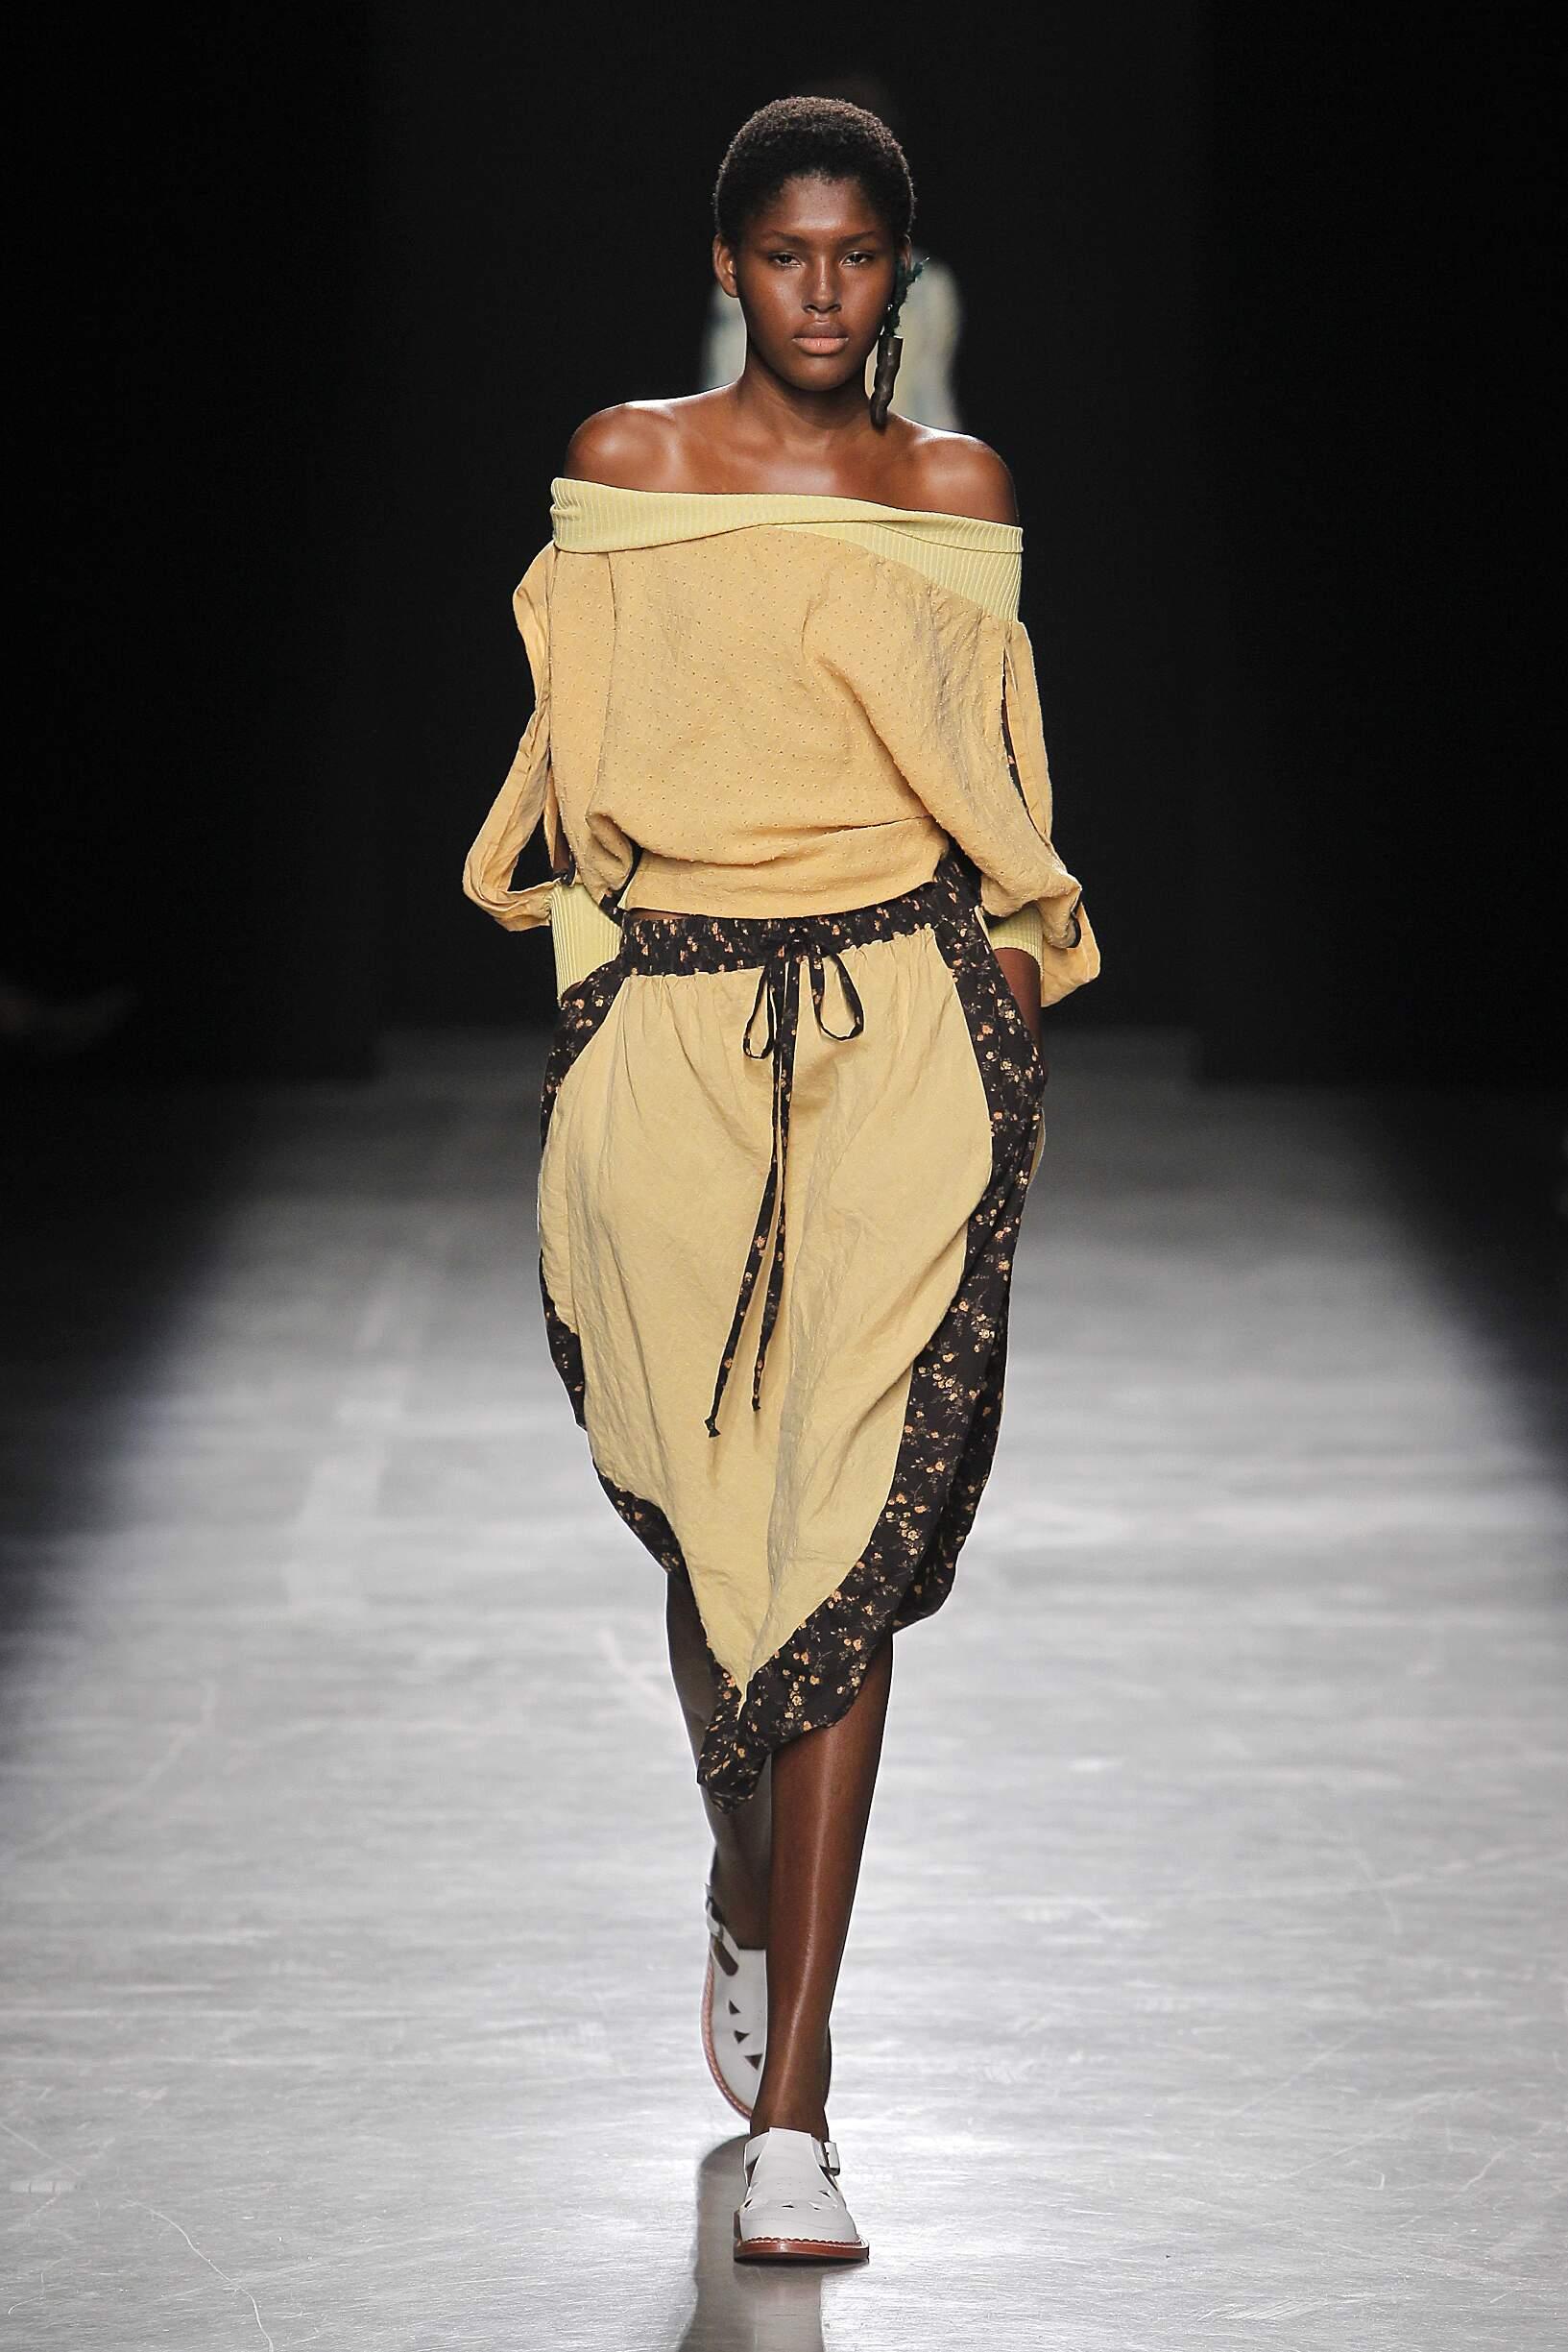 Spring Fashion Trends 2017 Andreas Kronthaler for Vivienne Westwood